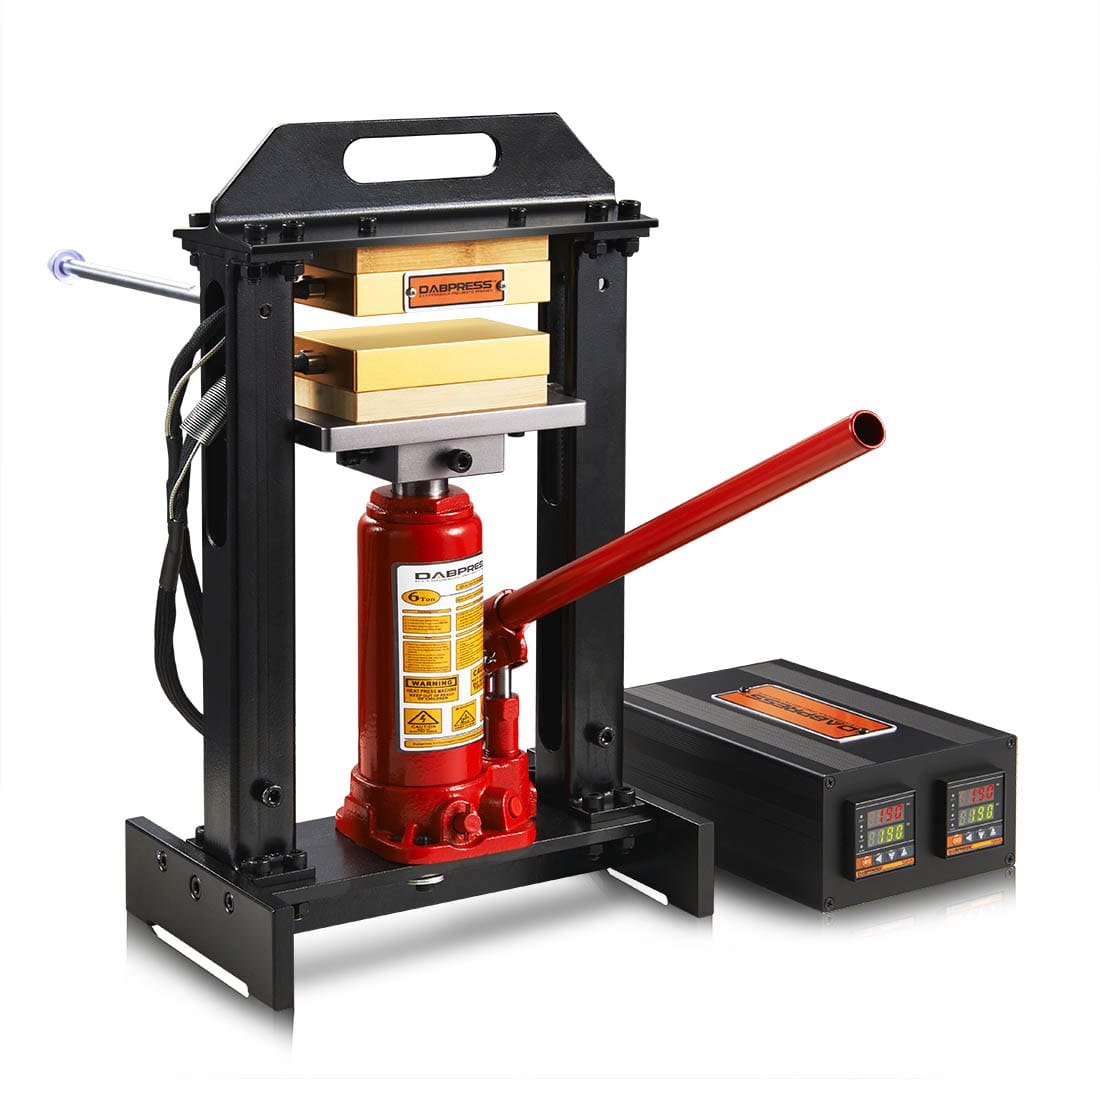 6 Tpm Portable Rosin Heat Press